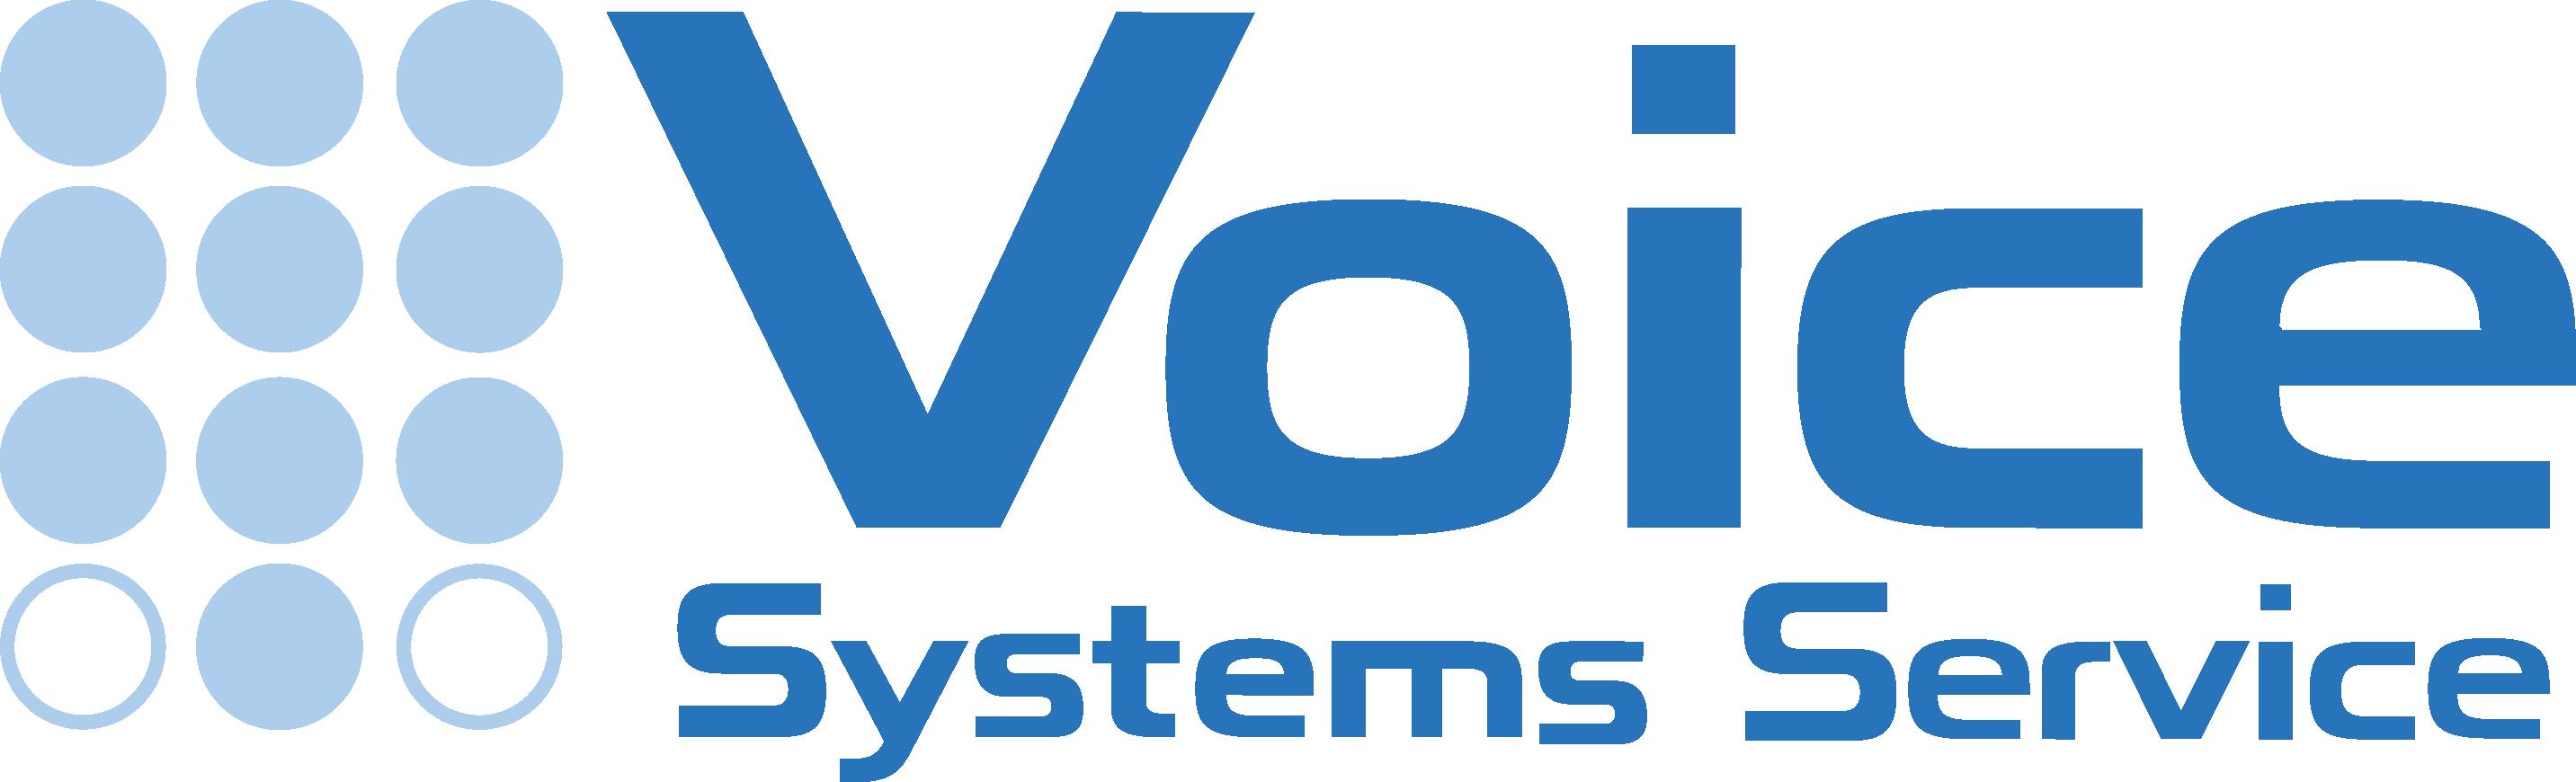 VSS 2line 2c blue